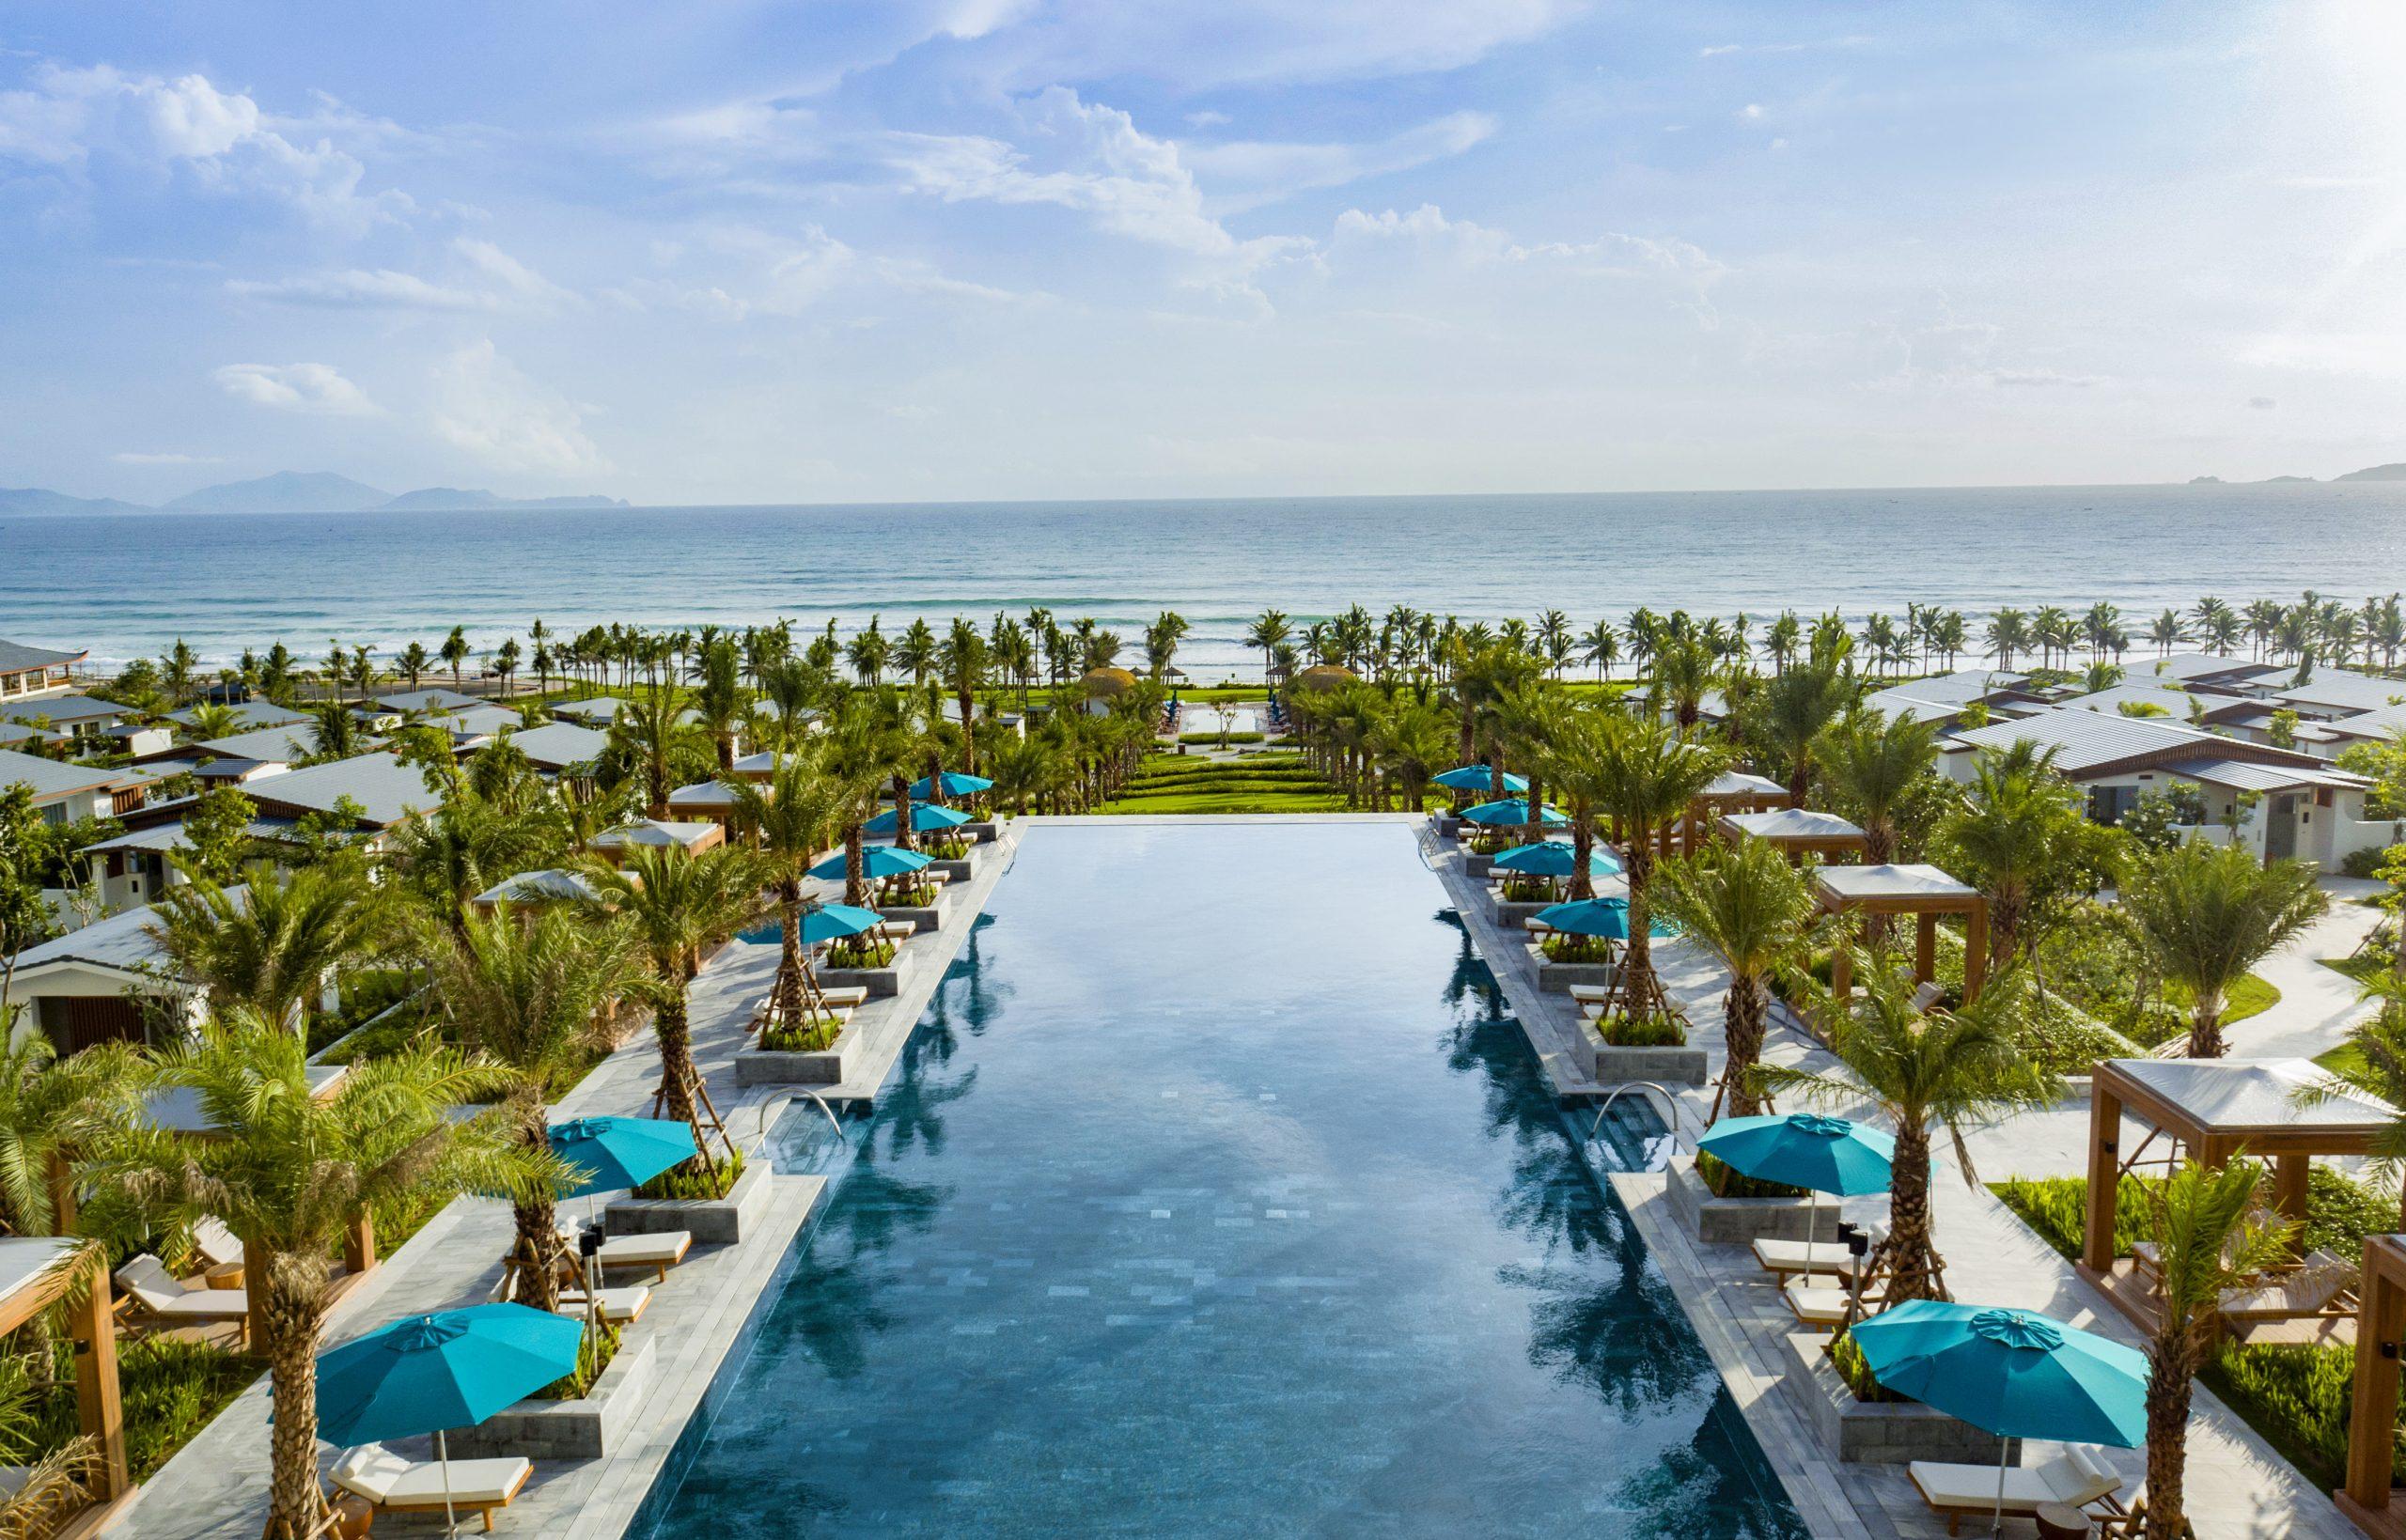 http://highend-traveller.com/radisson-blu-resort-cam-ranh-partners-with-mastercard-to-promote-travel-to-vietnams-hottest-new-beach-destination/